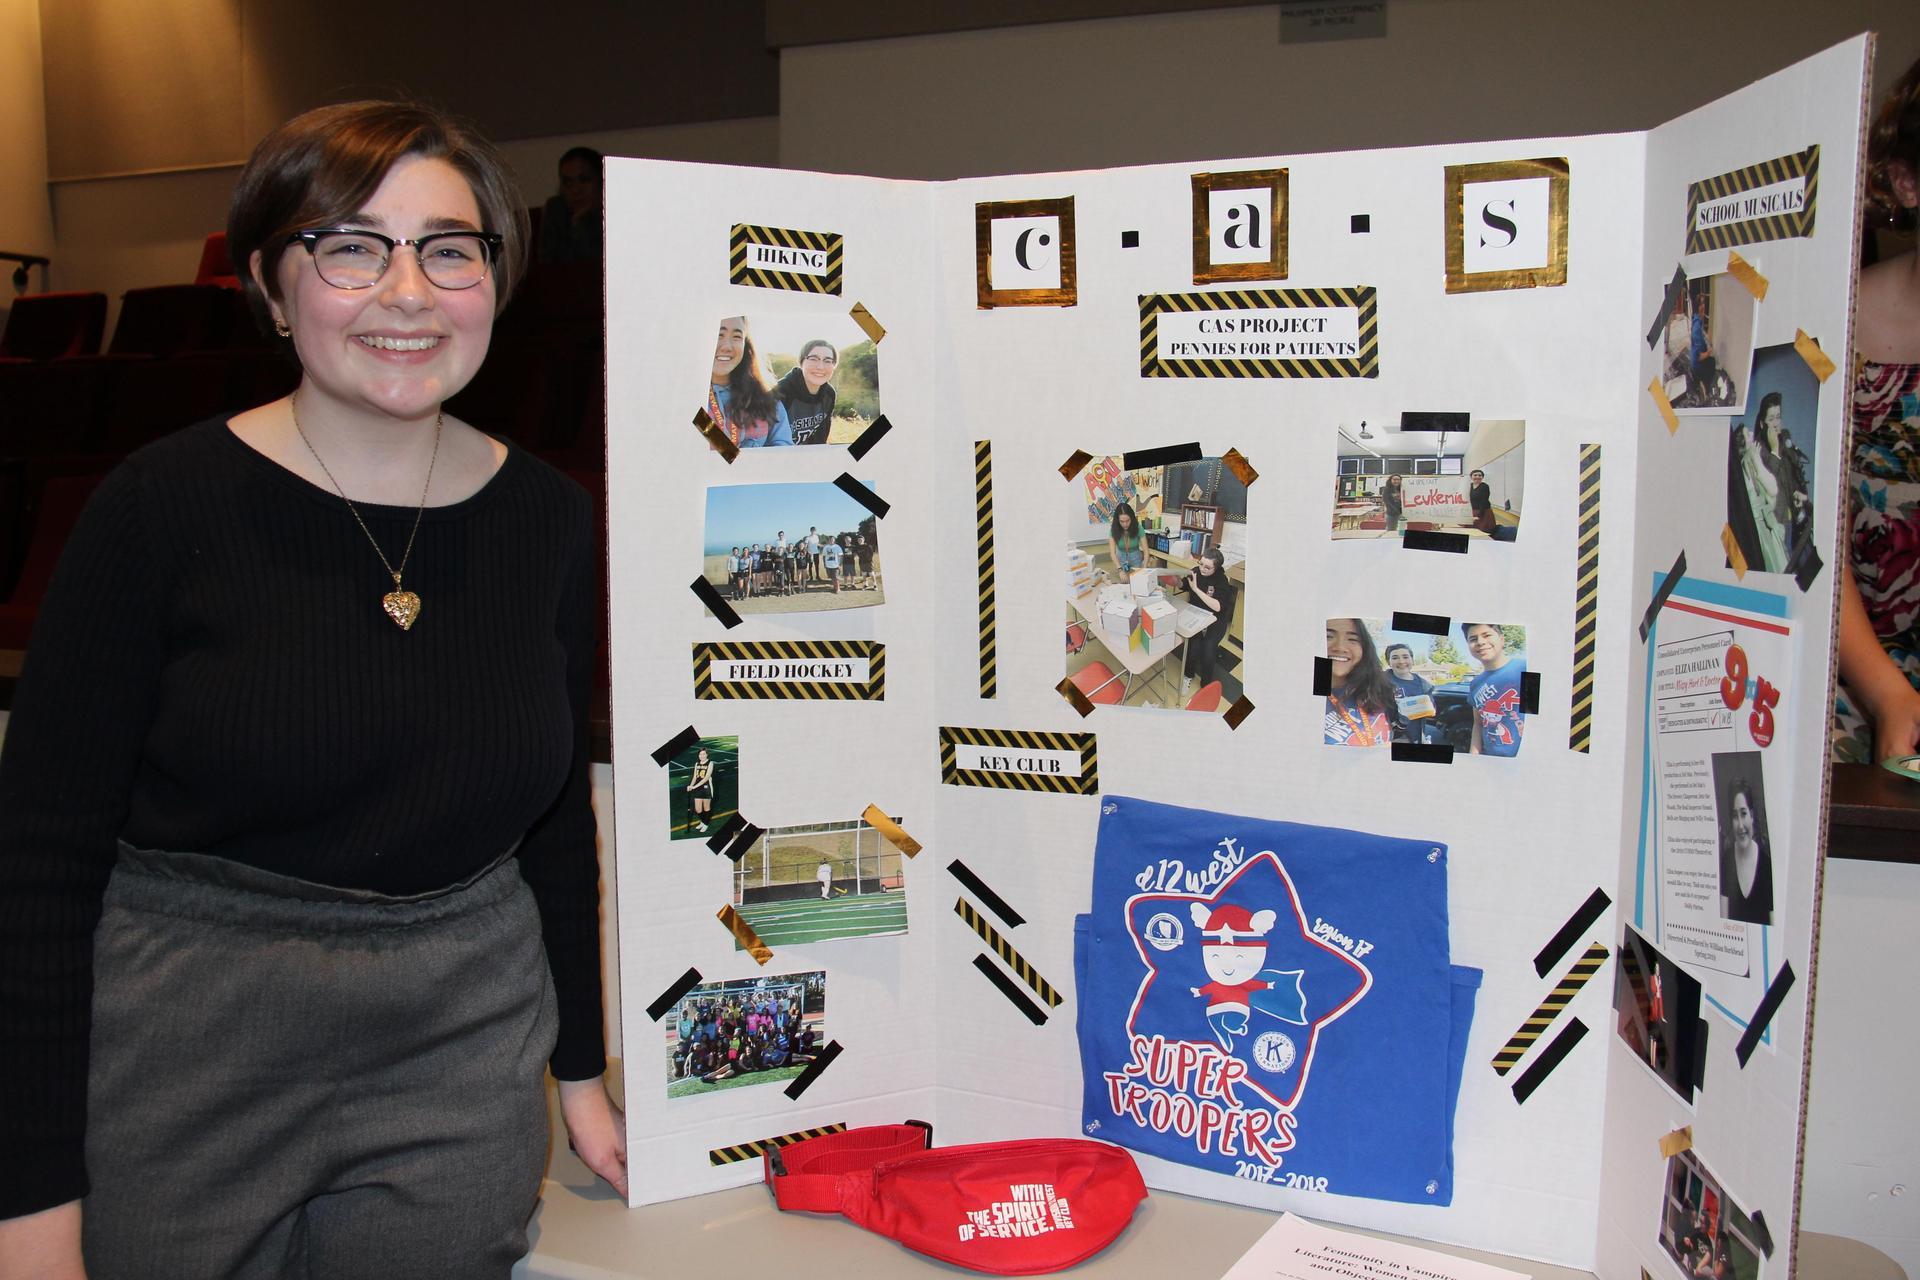 Image of IB Student - Eliza - showcasing her Creativity, Activity & Service experiences